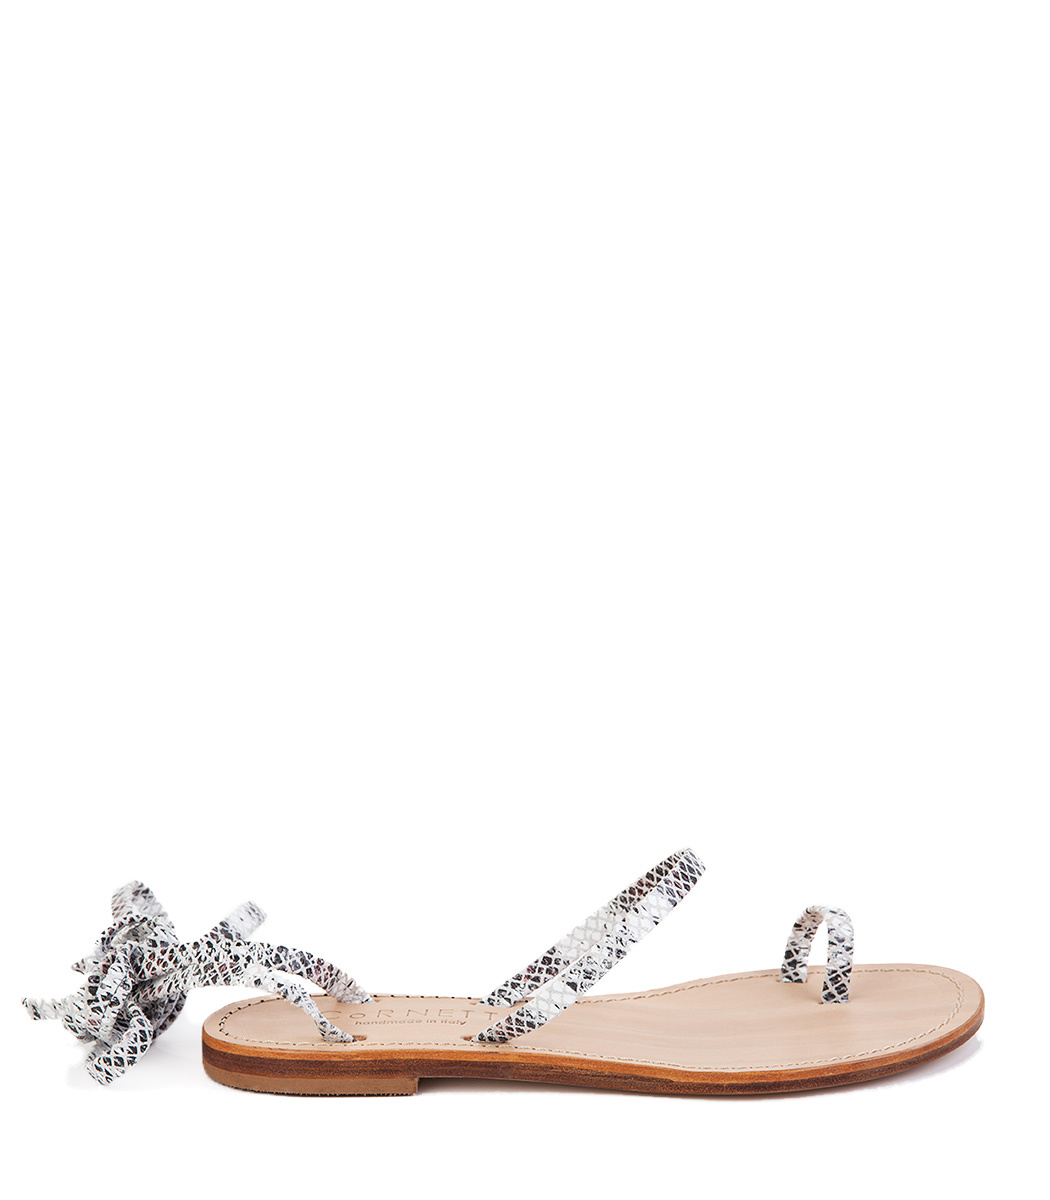 CORNETTI Alicudi Sandal In White Python Embosed Leather